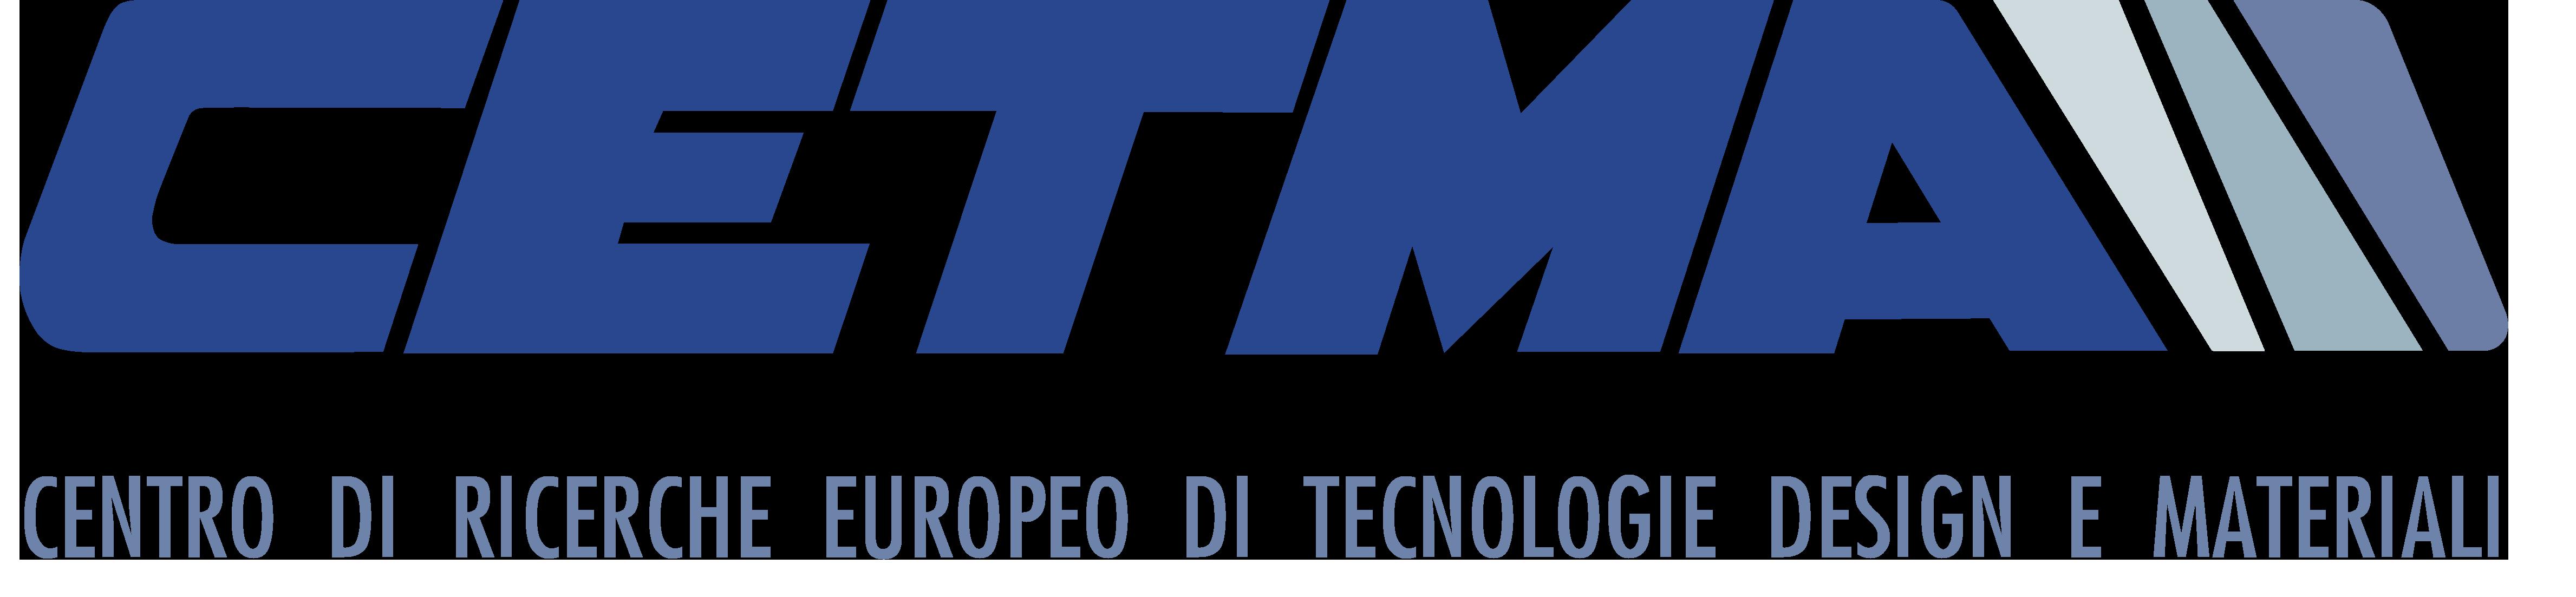 01-Logo_Cetma_2017_IT_1562162177 (1)